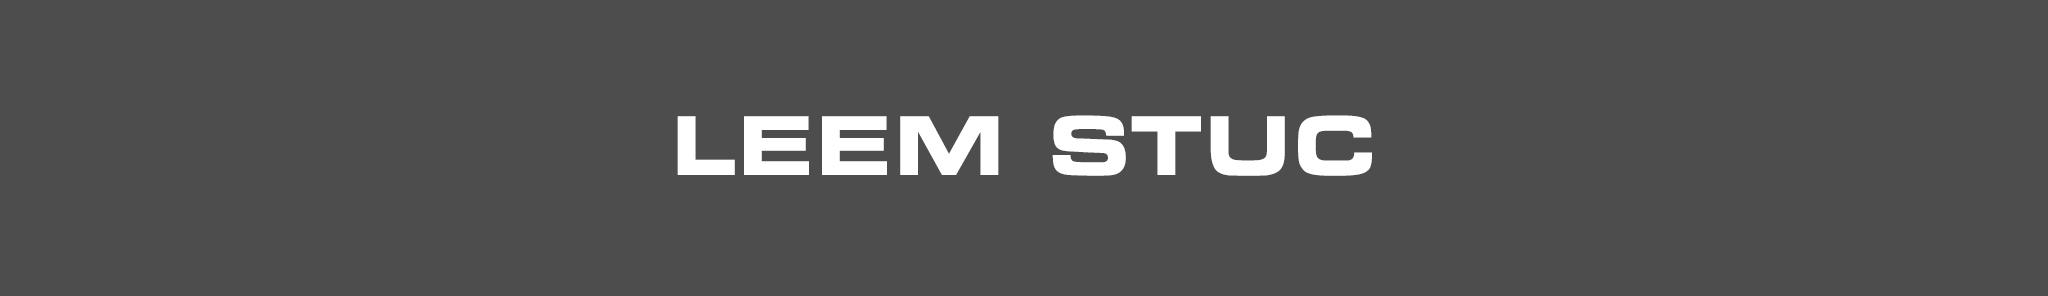 leem-stuc